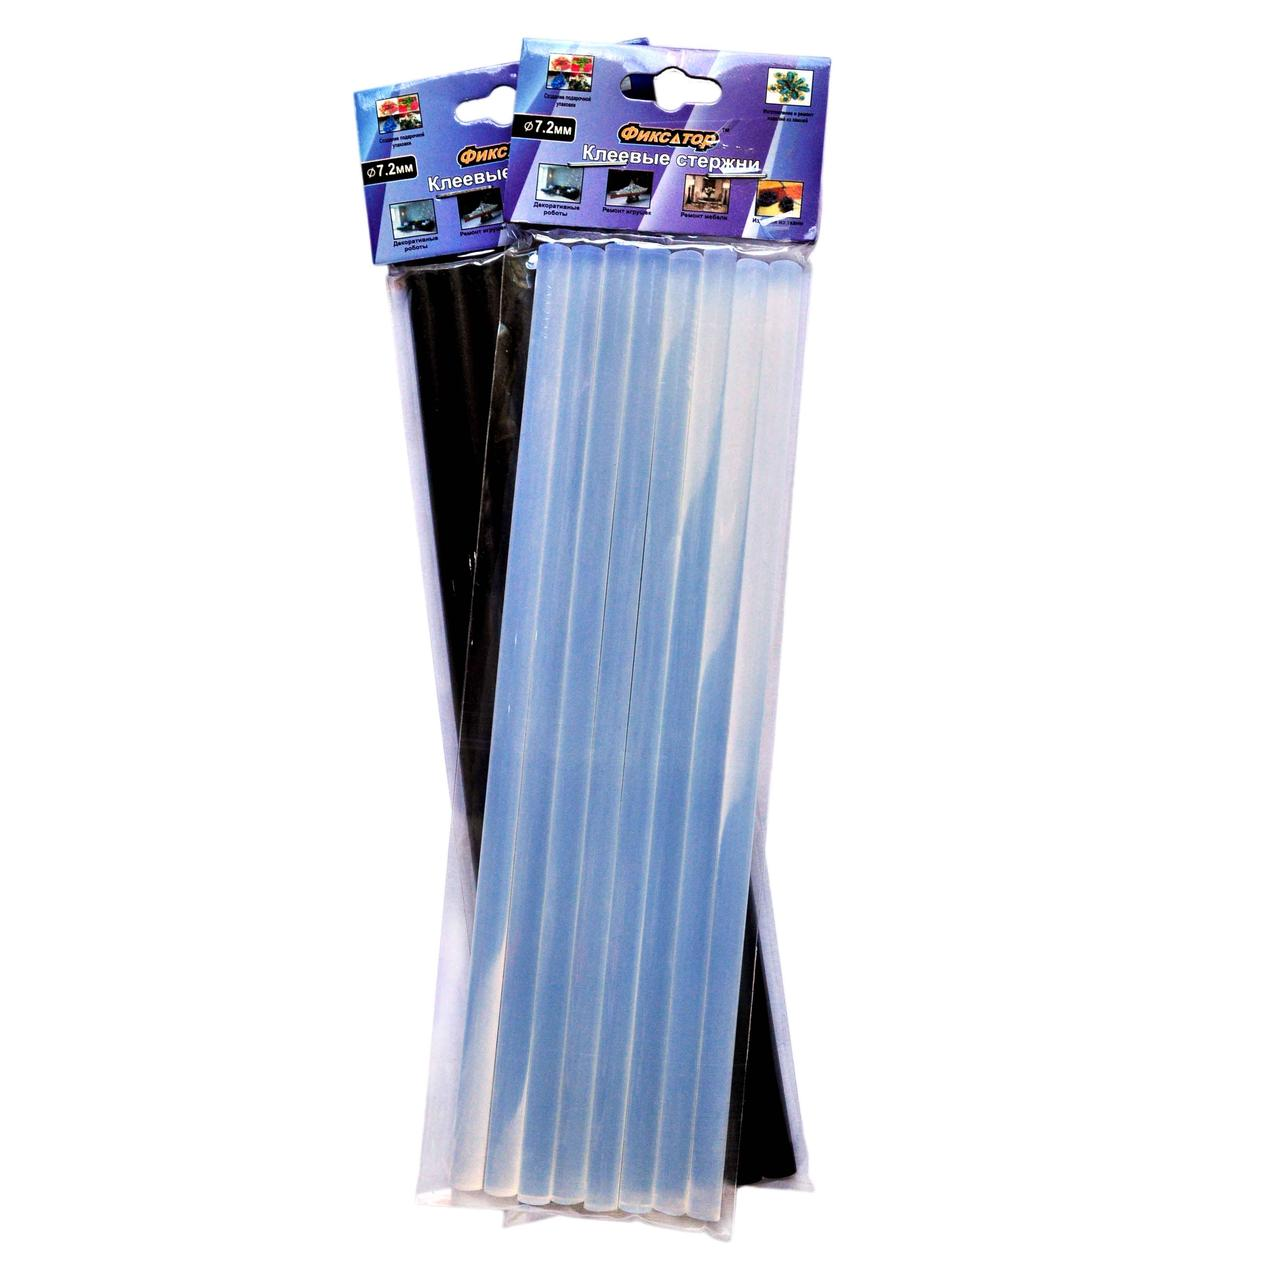 Клеевые стержни Фиксатор (Ф-7.2 длина 200мм) Упаковка 8шт